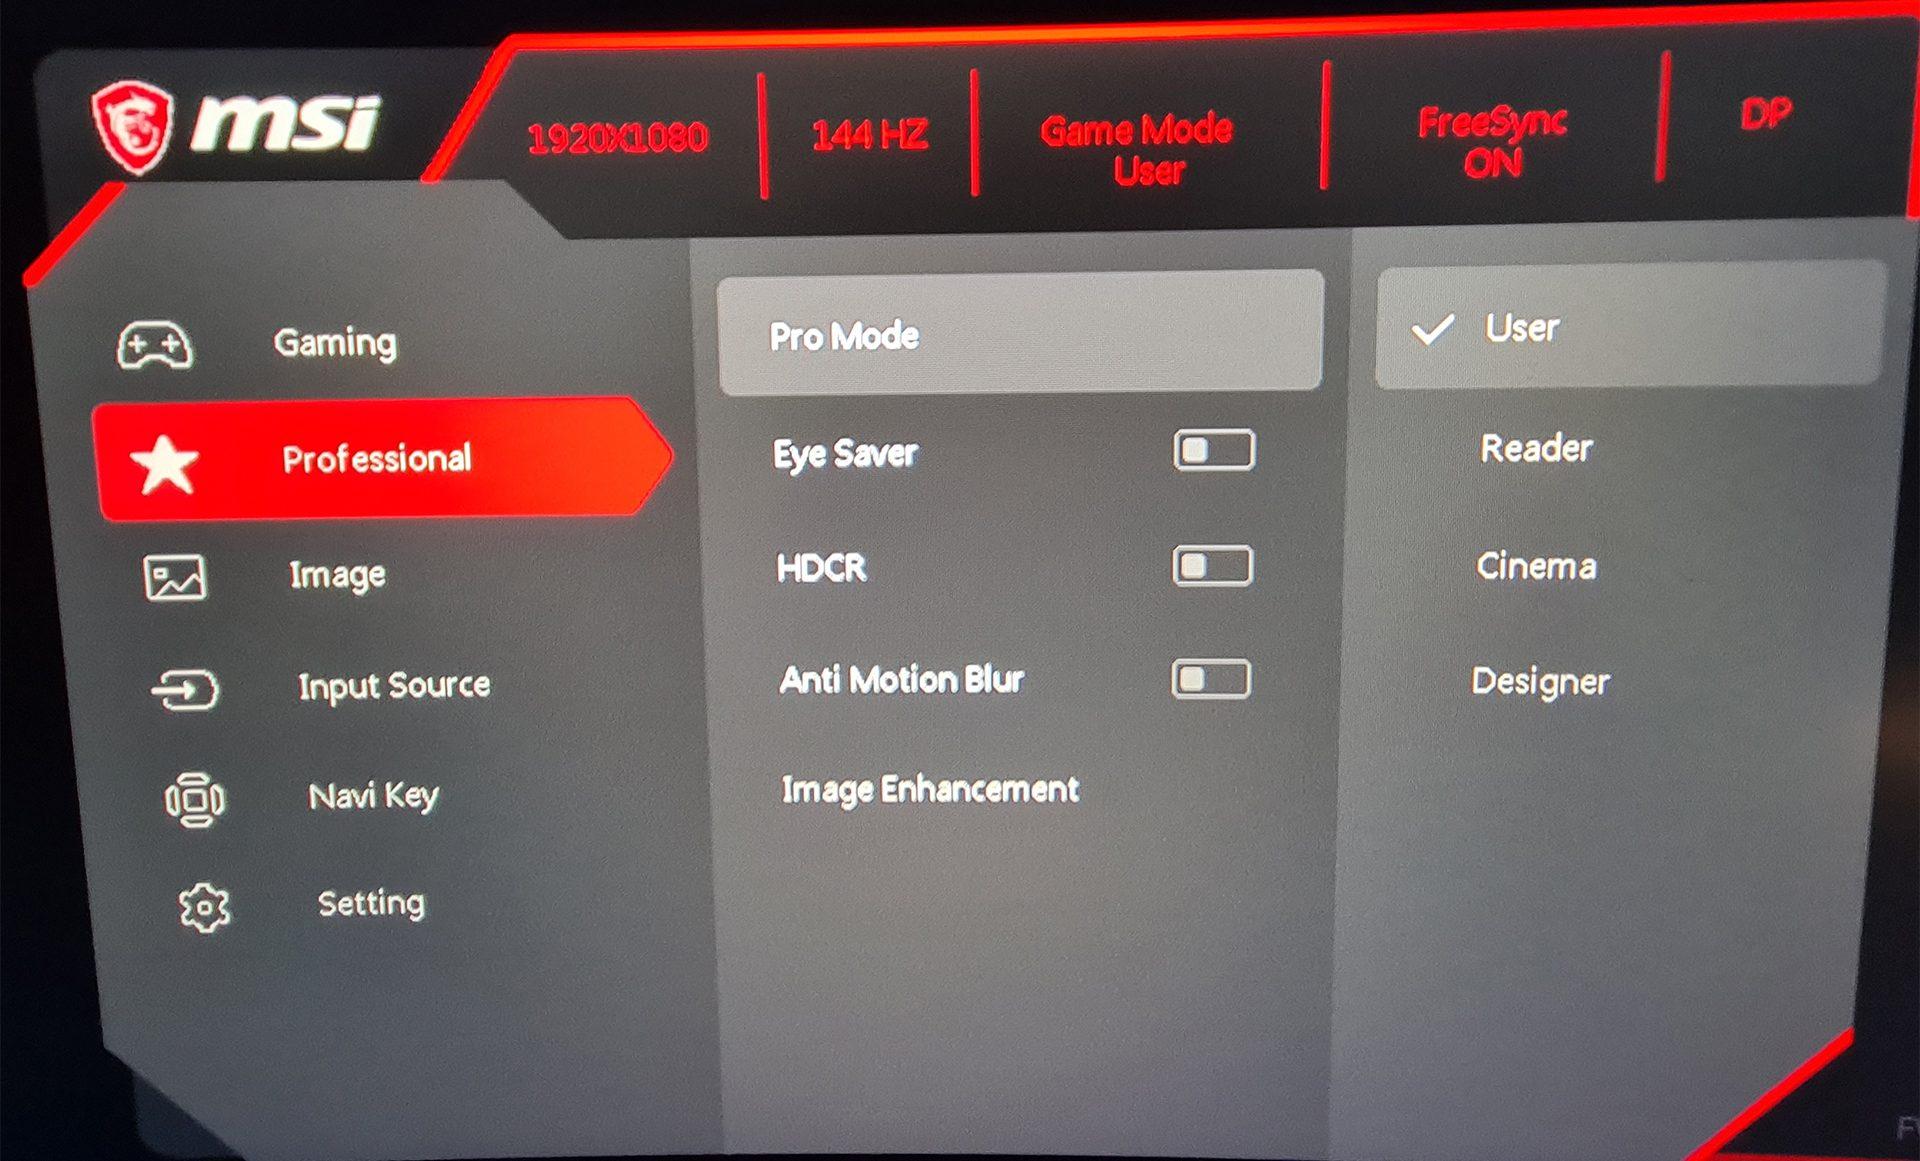 MSI Optix MAG271CR - Interface